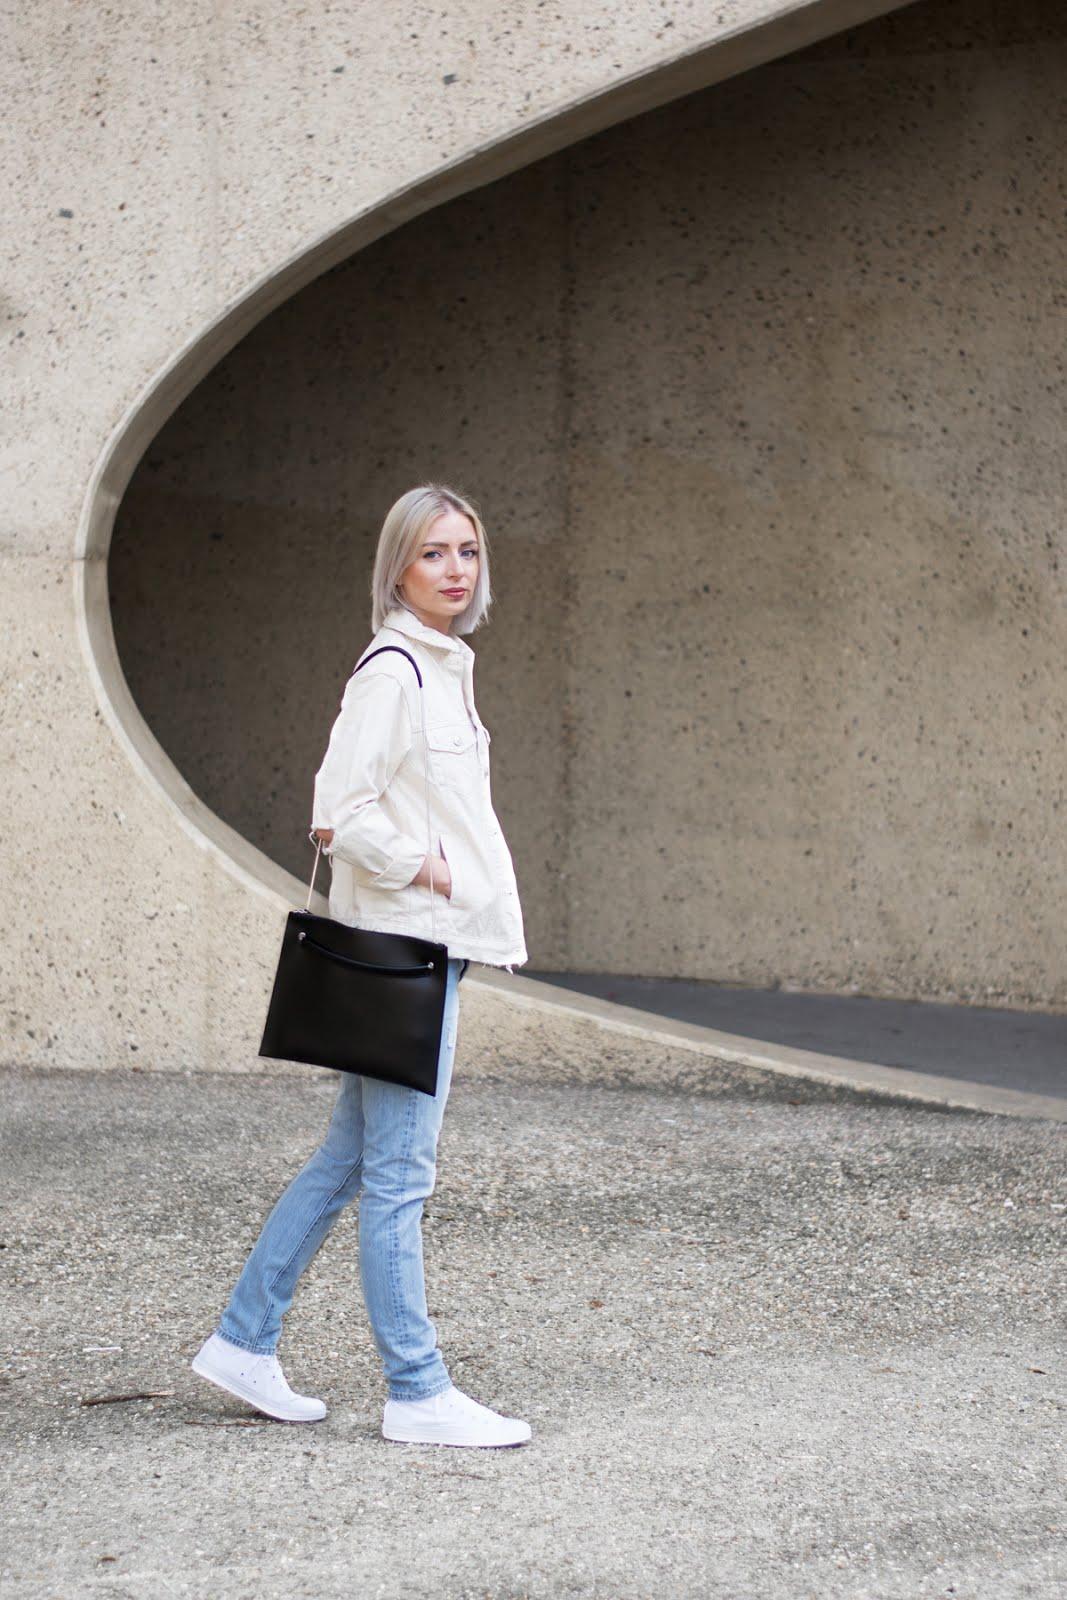 Topshop denim jacket, ecru, White polo shirt noisy may, levi's vintage 501 Skinny jeans, Converse all star hi white, Flippa k bag, SS17, zalando, outfit, vroenhoven, minimal